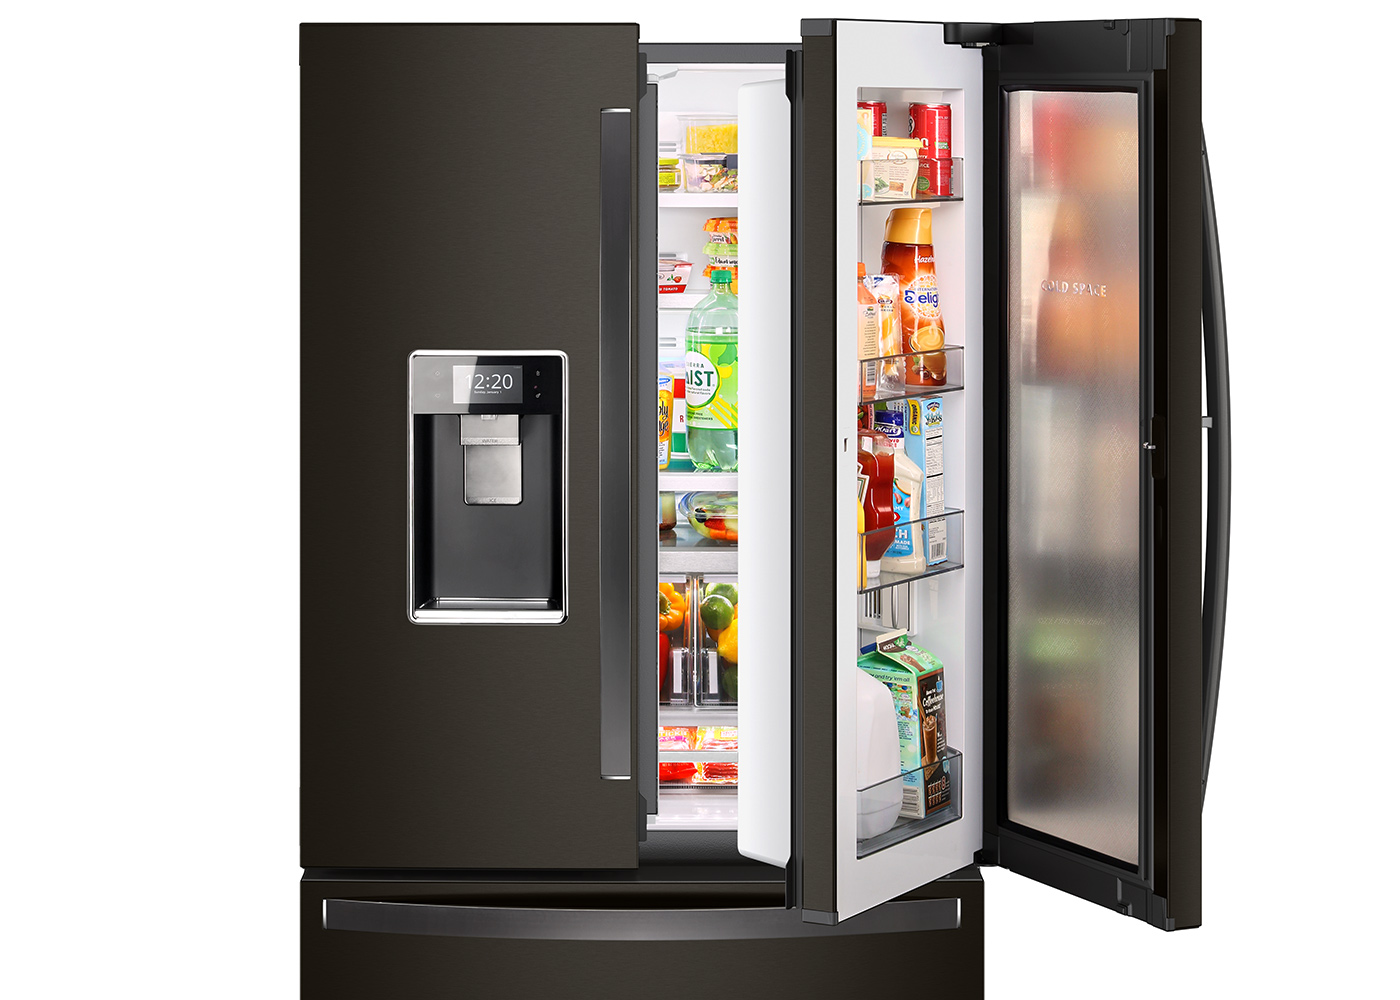 si-refrigerator